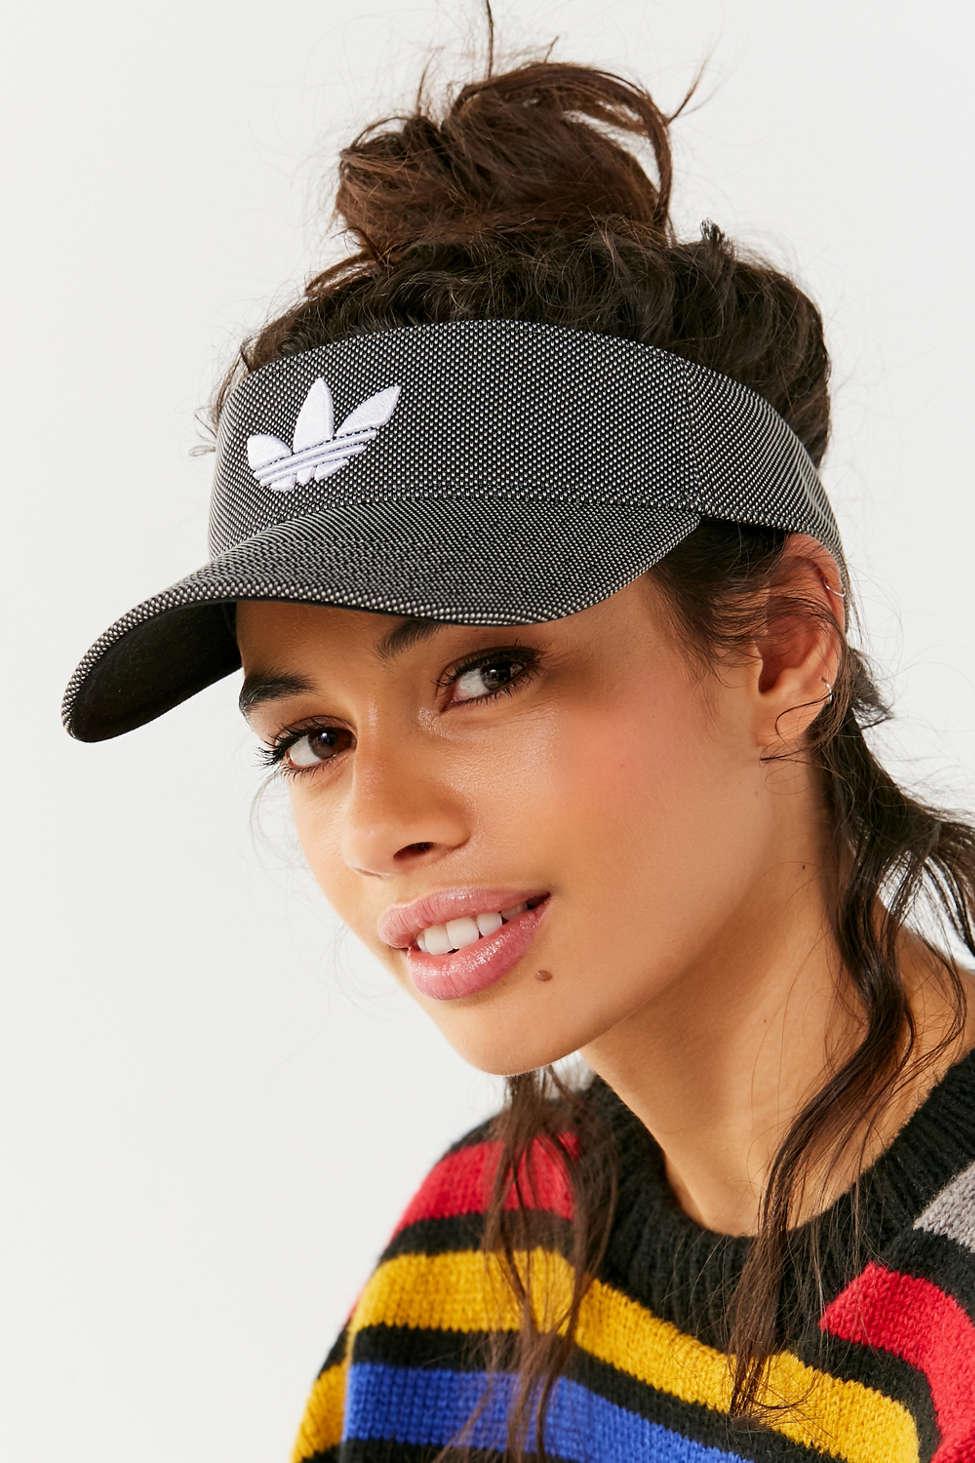 Adidas Originals Trefoil visera Urban Outfitters